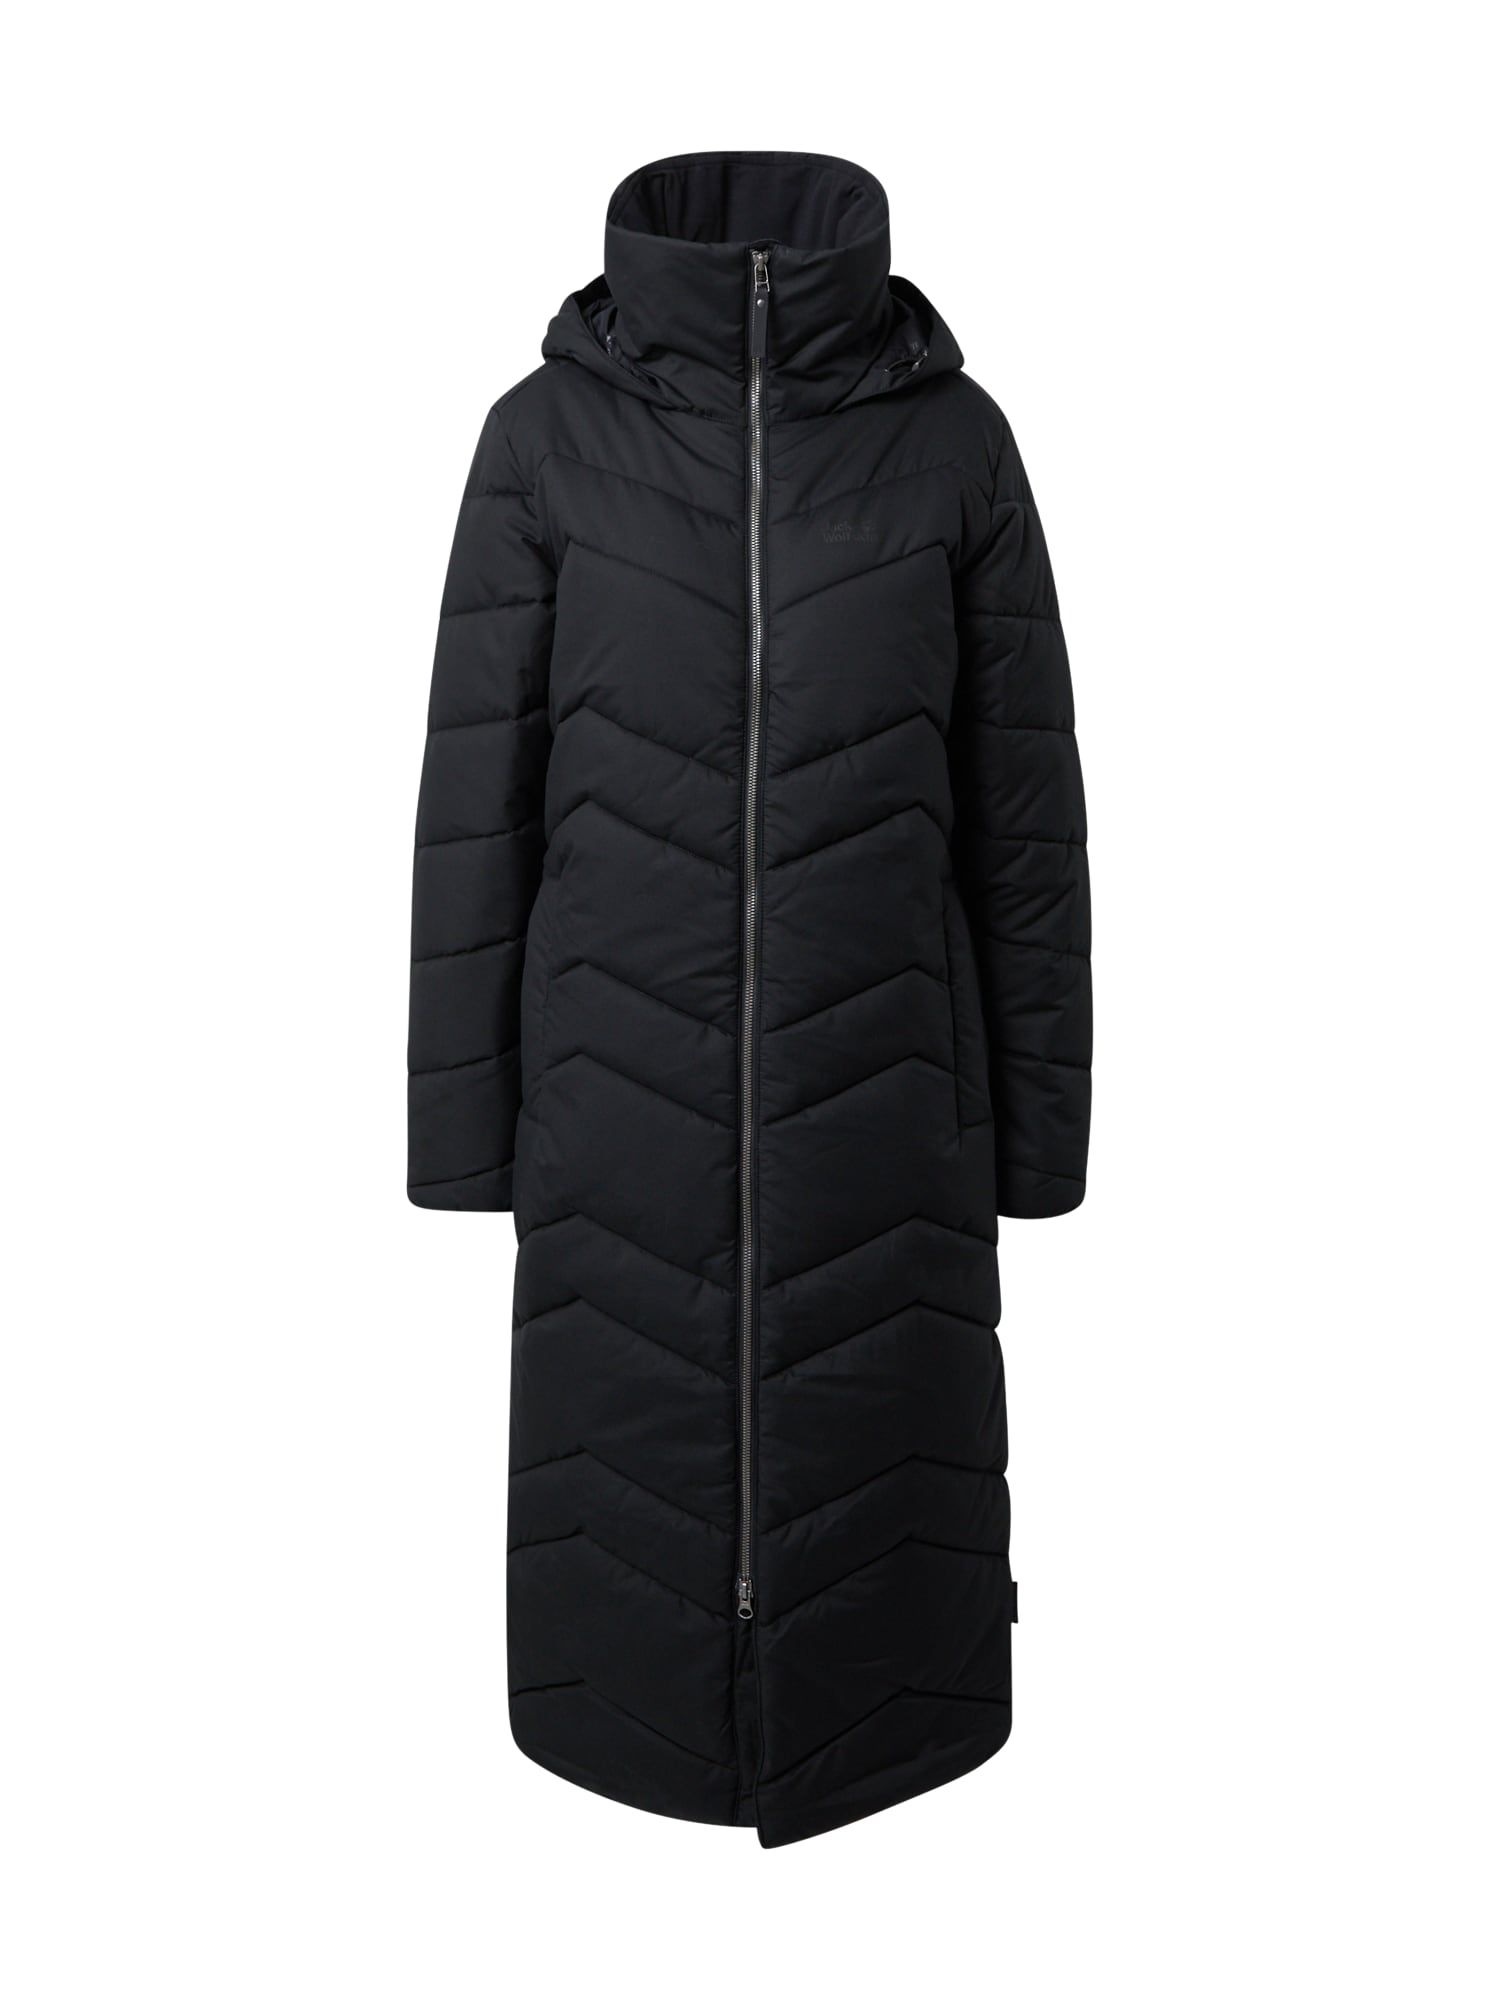 JACK WOLFSKIN Laisvalaikio paltas